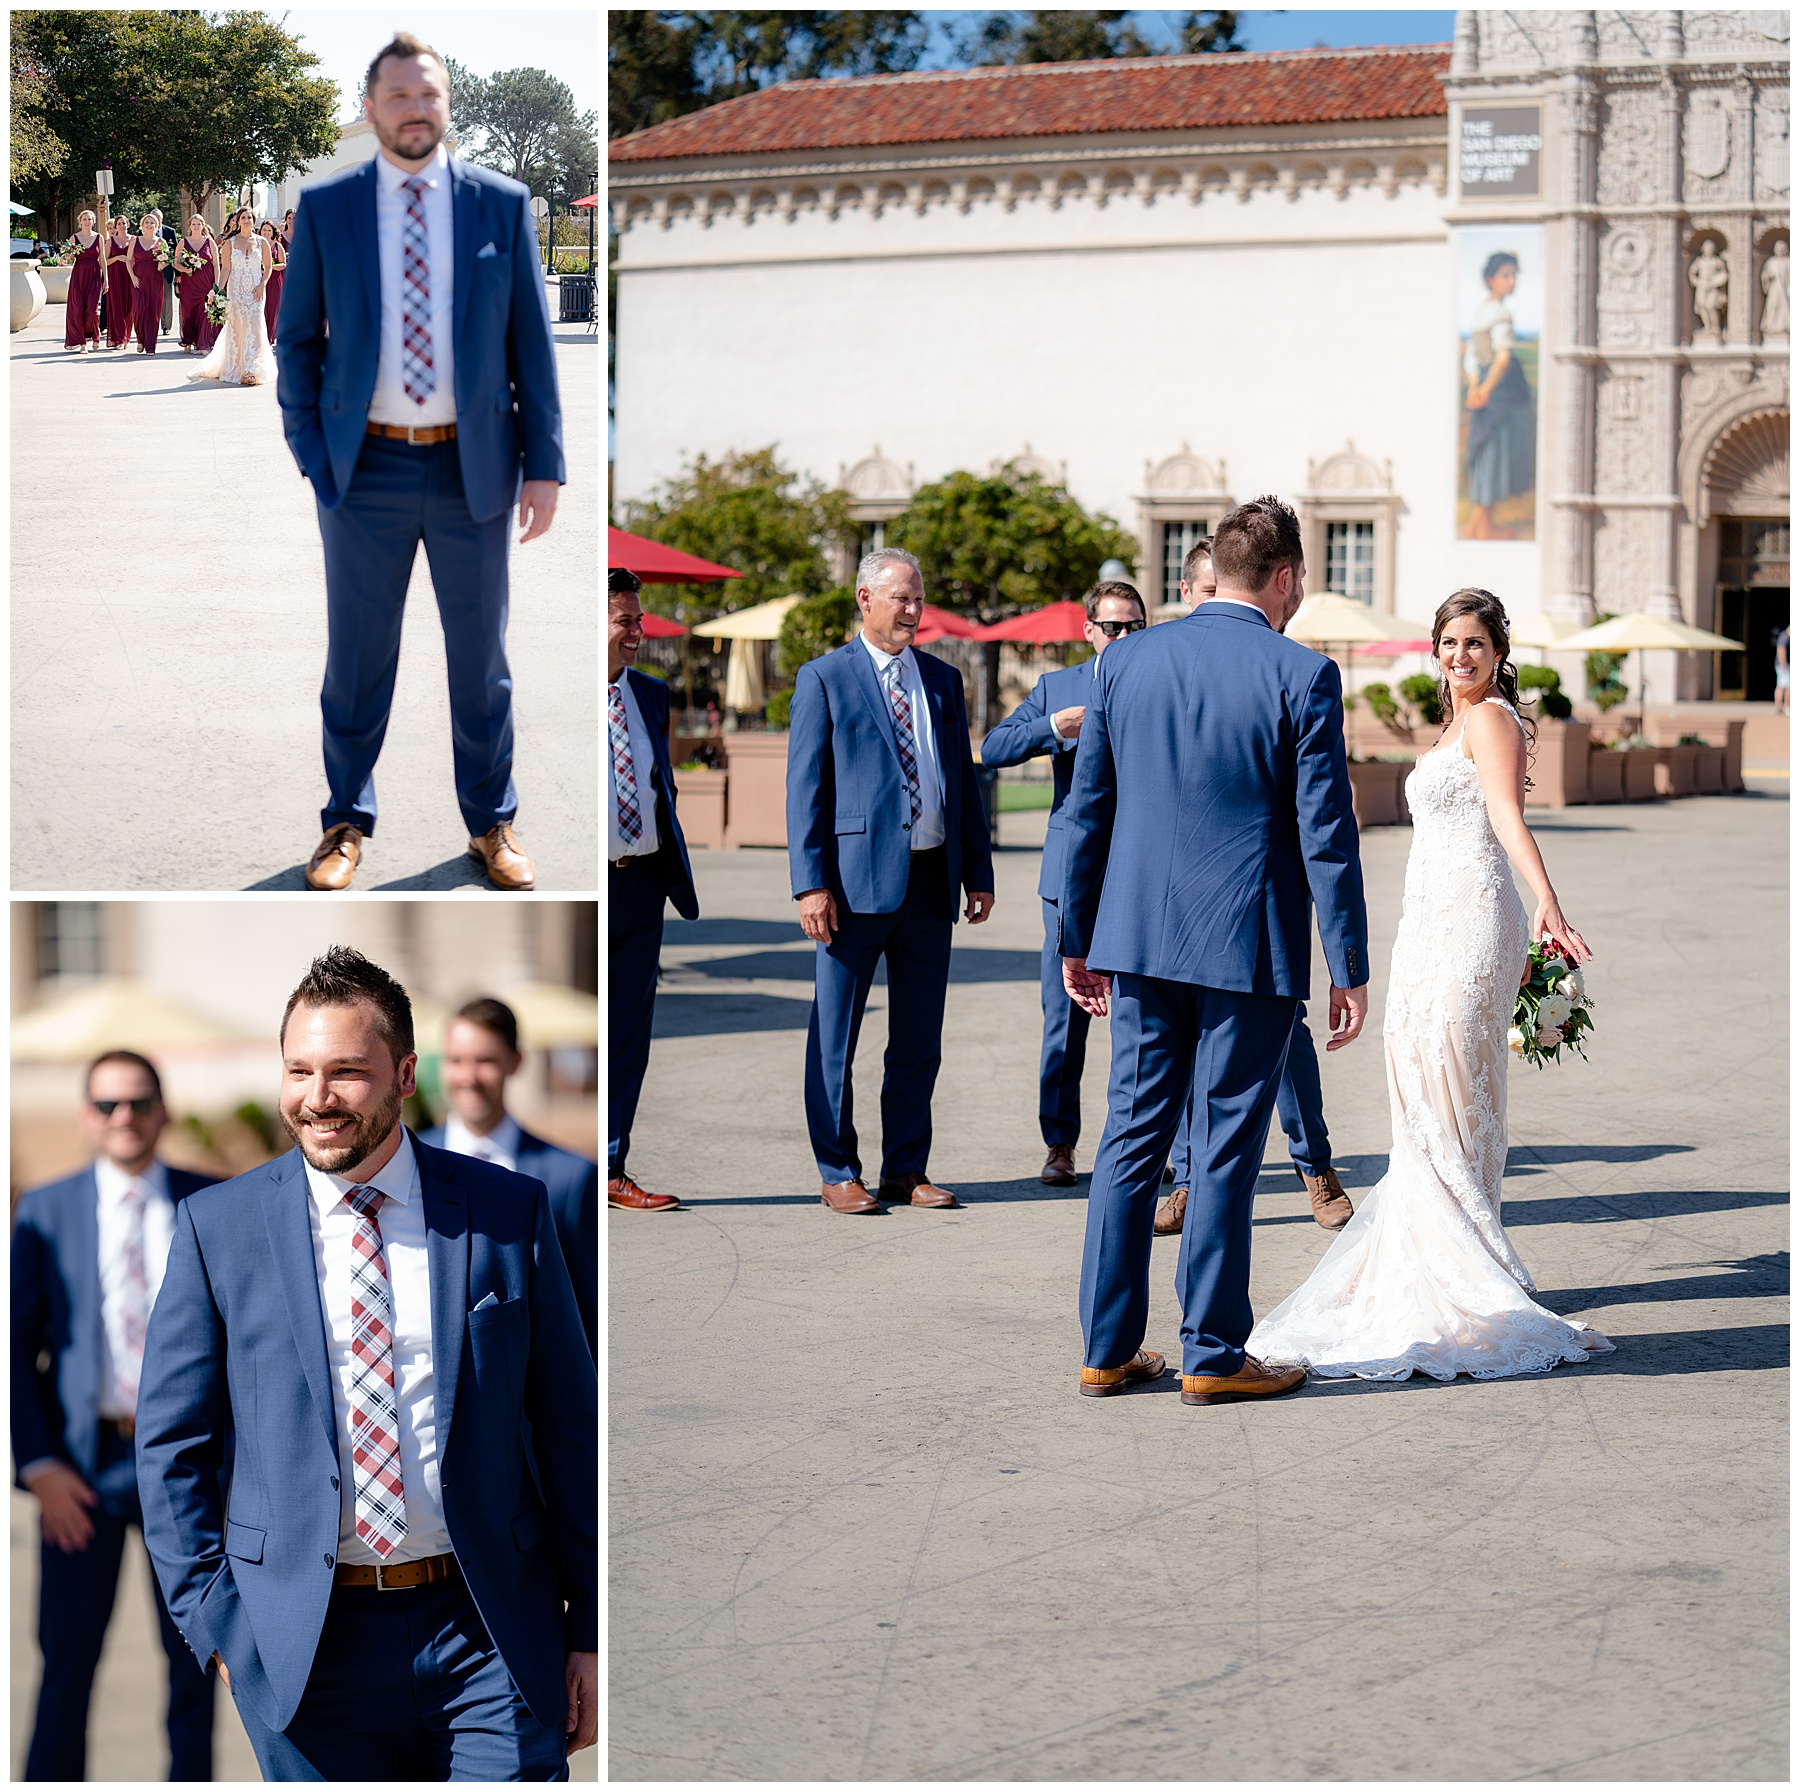 bride and groom first look wedding photos at balboa park